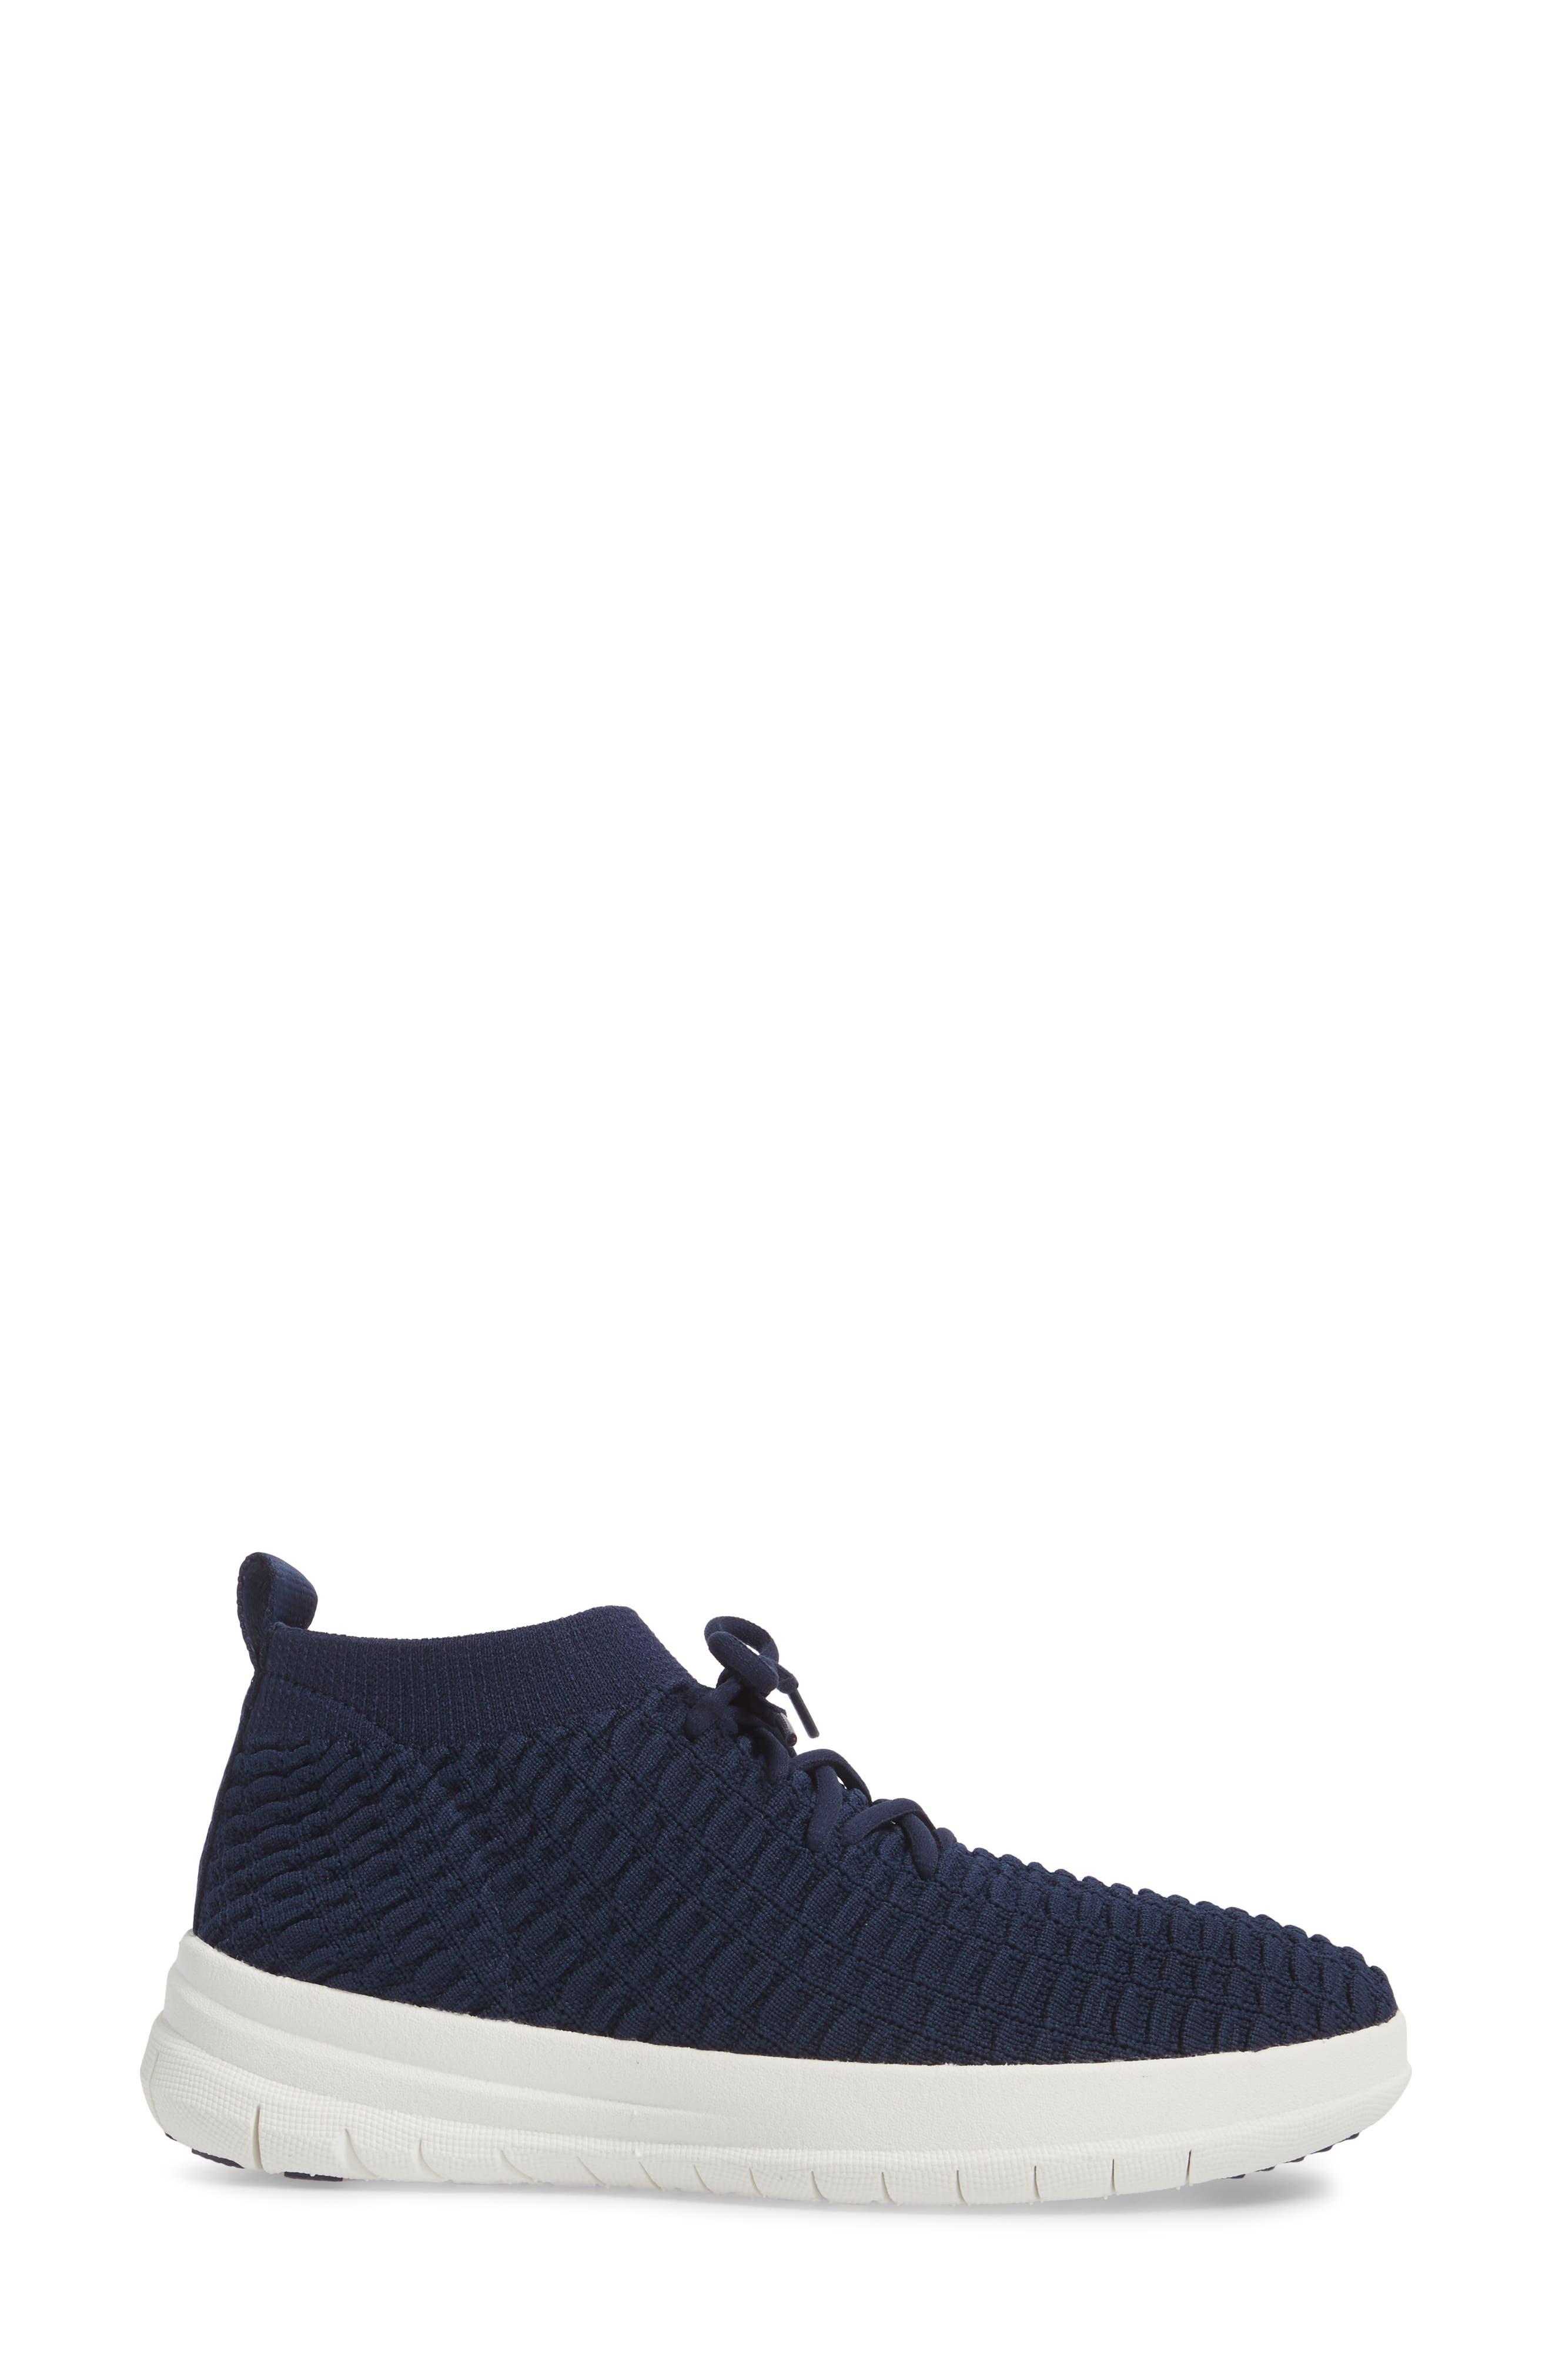 Uberknit<sup>™</sup> Slip-On High Top Sneaker,                             Alternate thumbnail 3, color,                             Midnight Navy